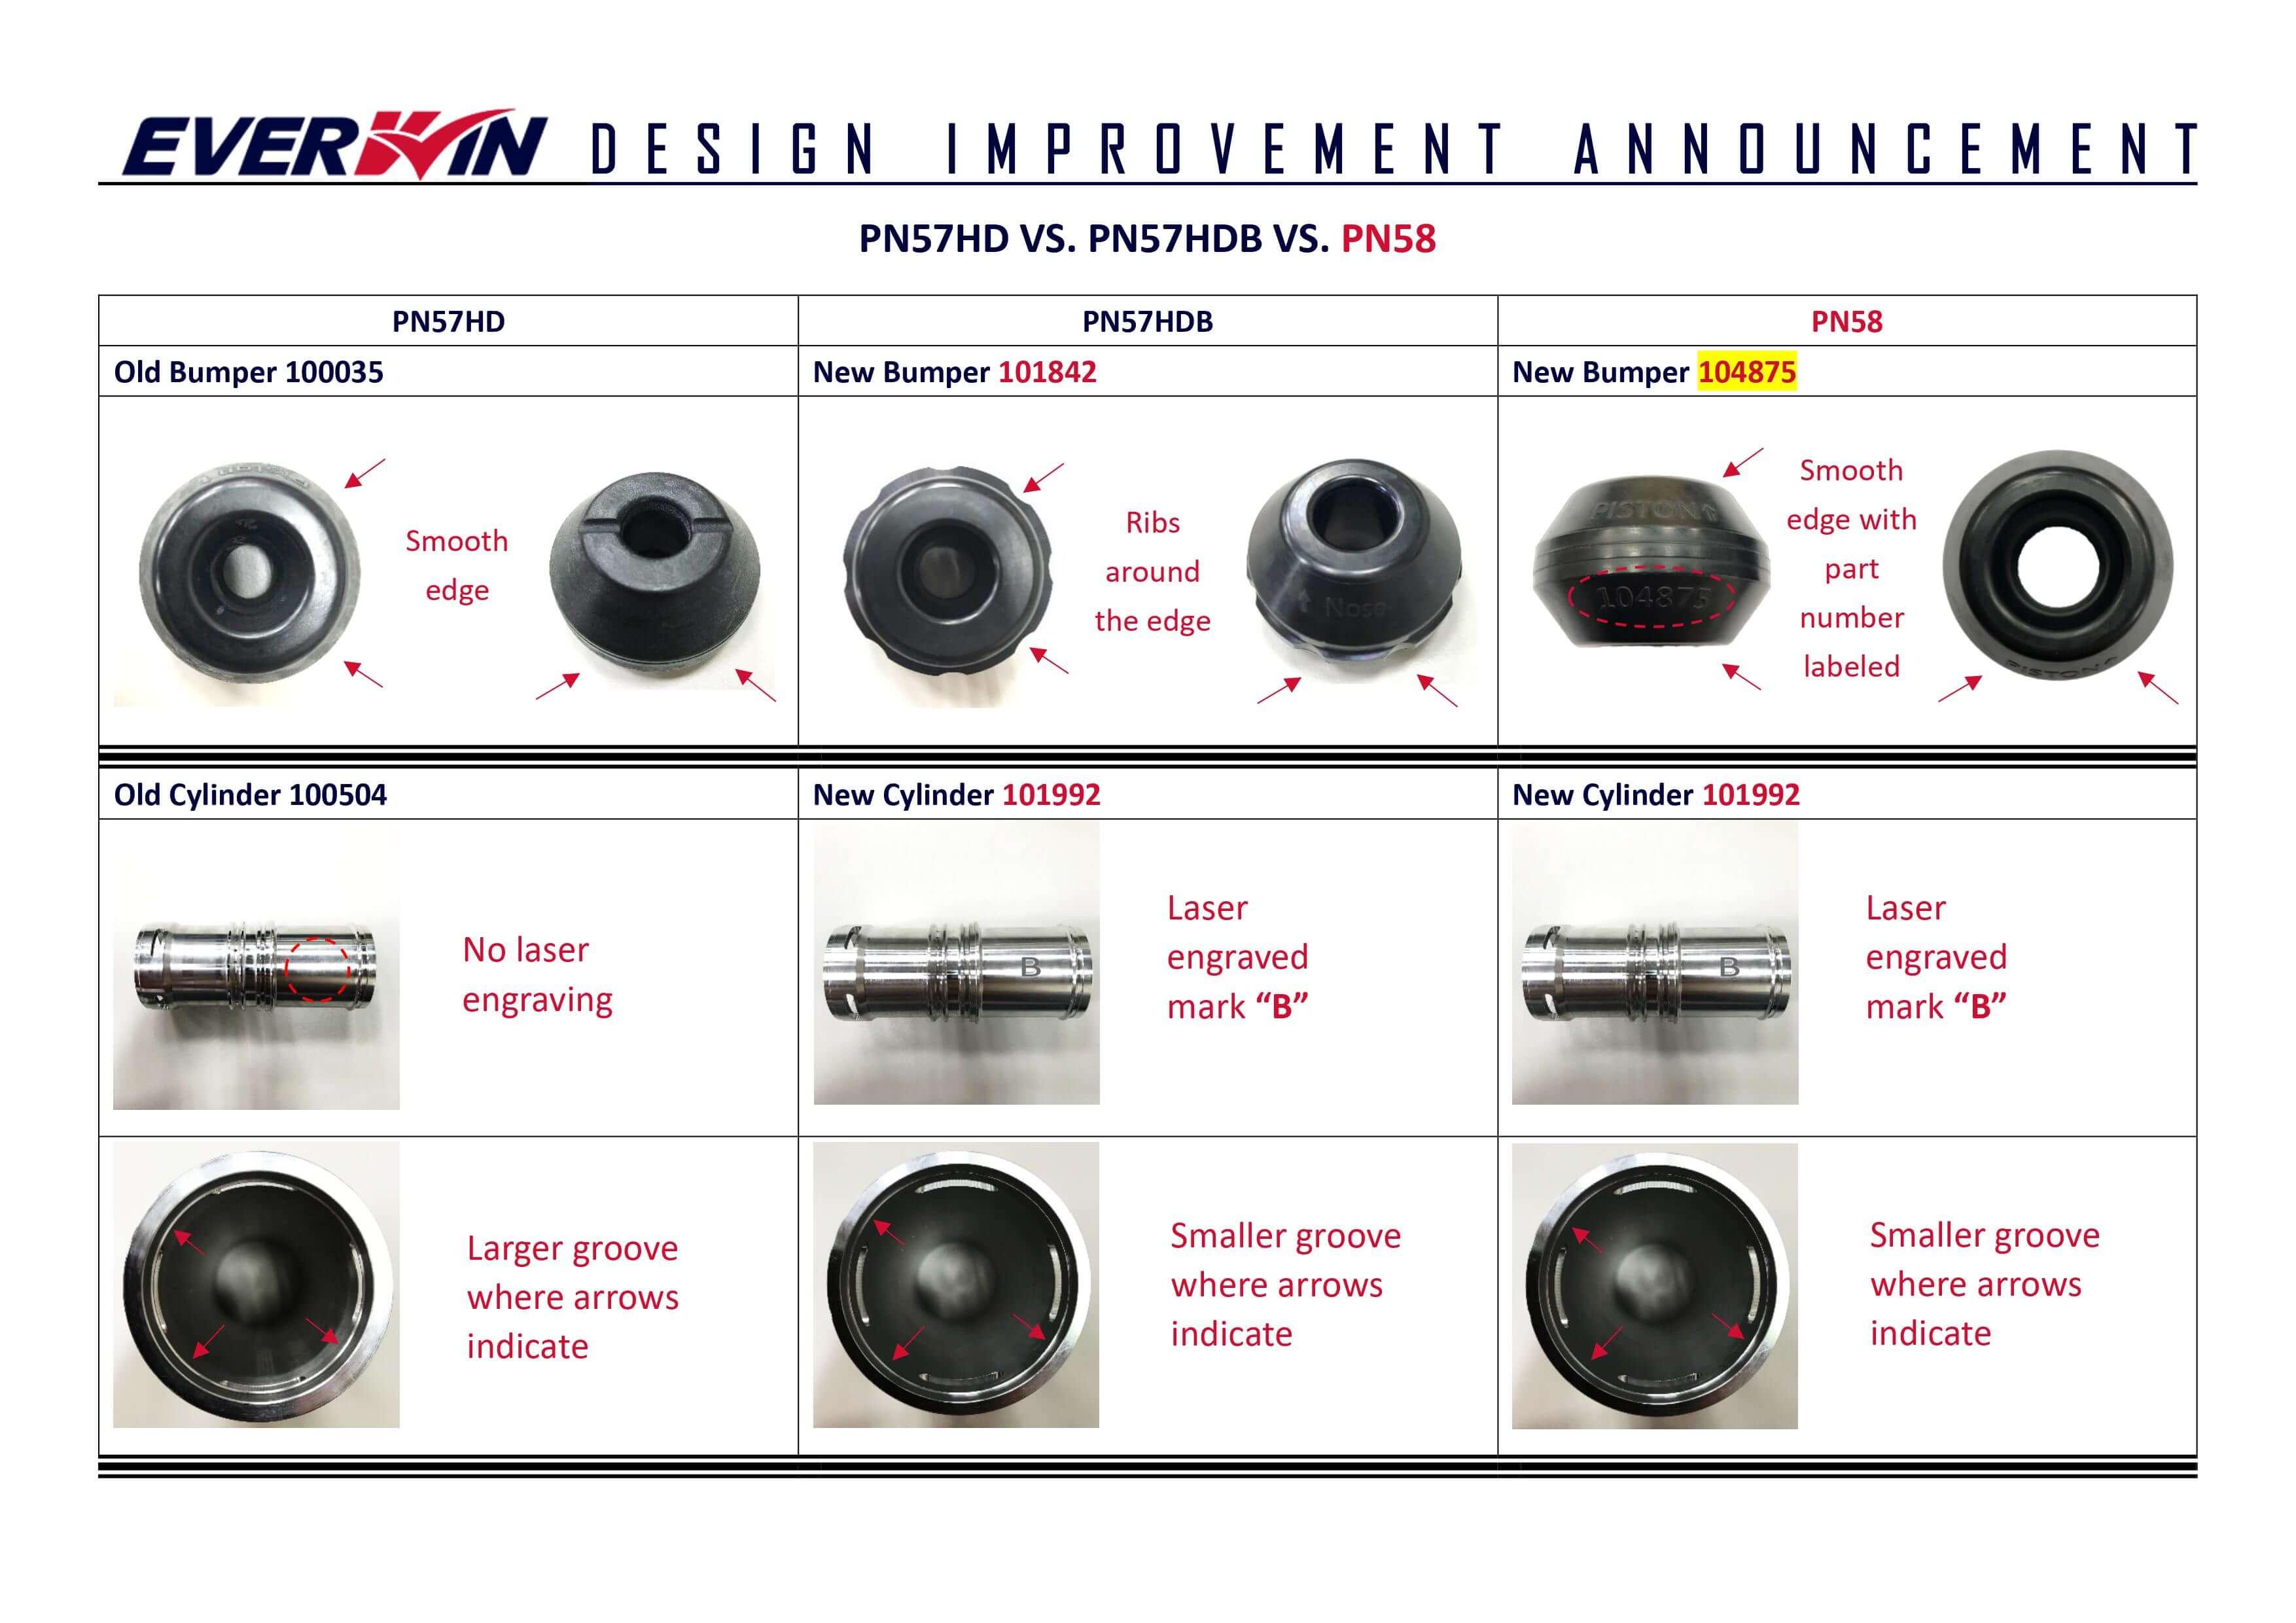 Product-Update-Announcement-PN58-1.jpg (580 KB)